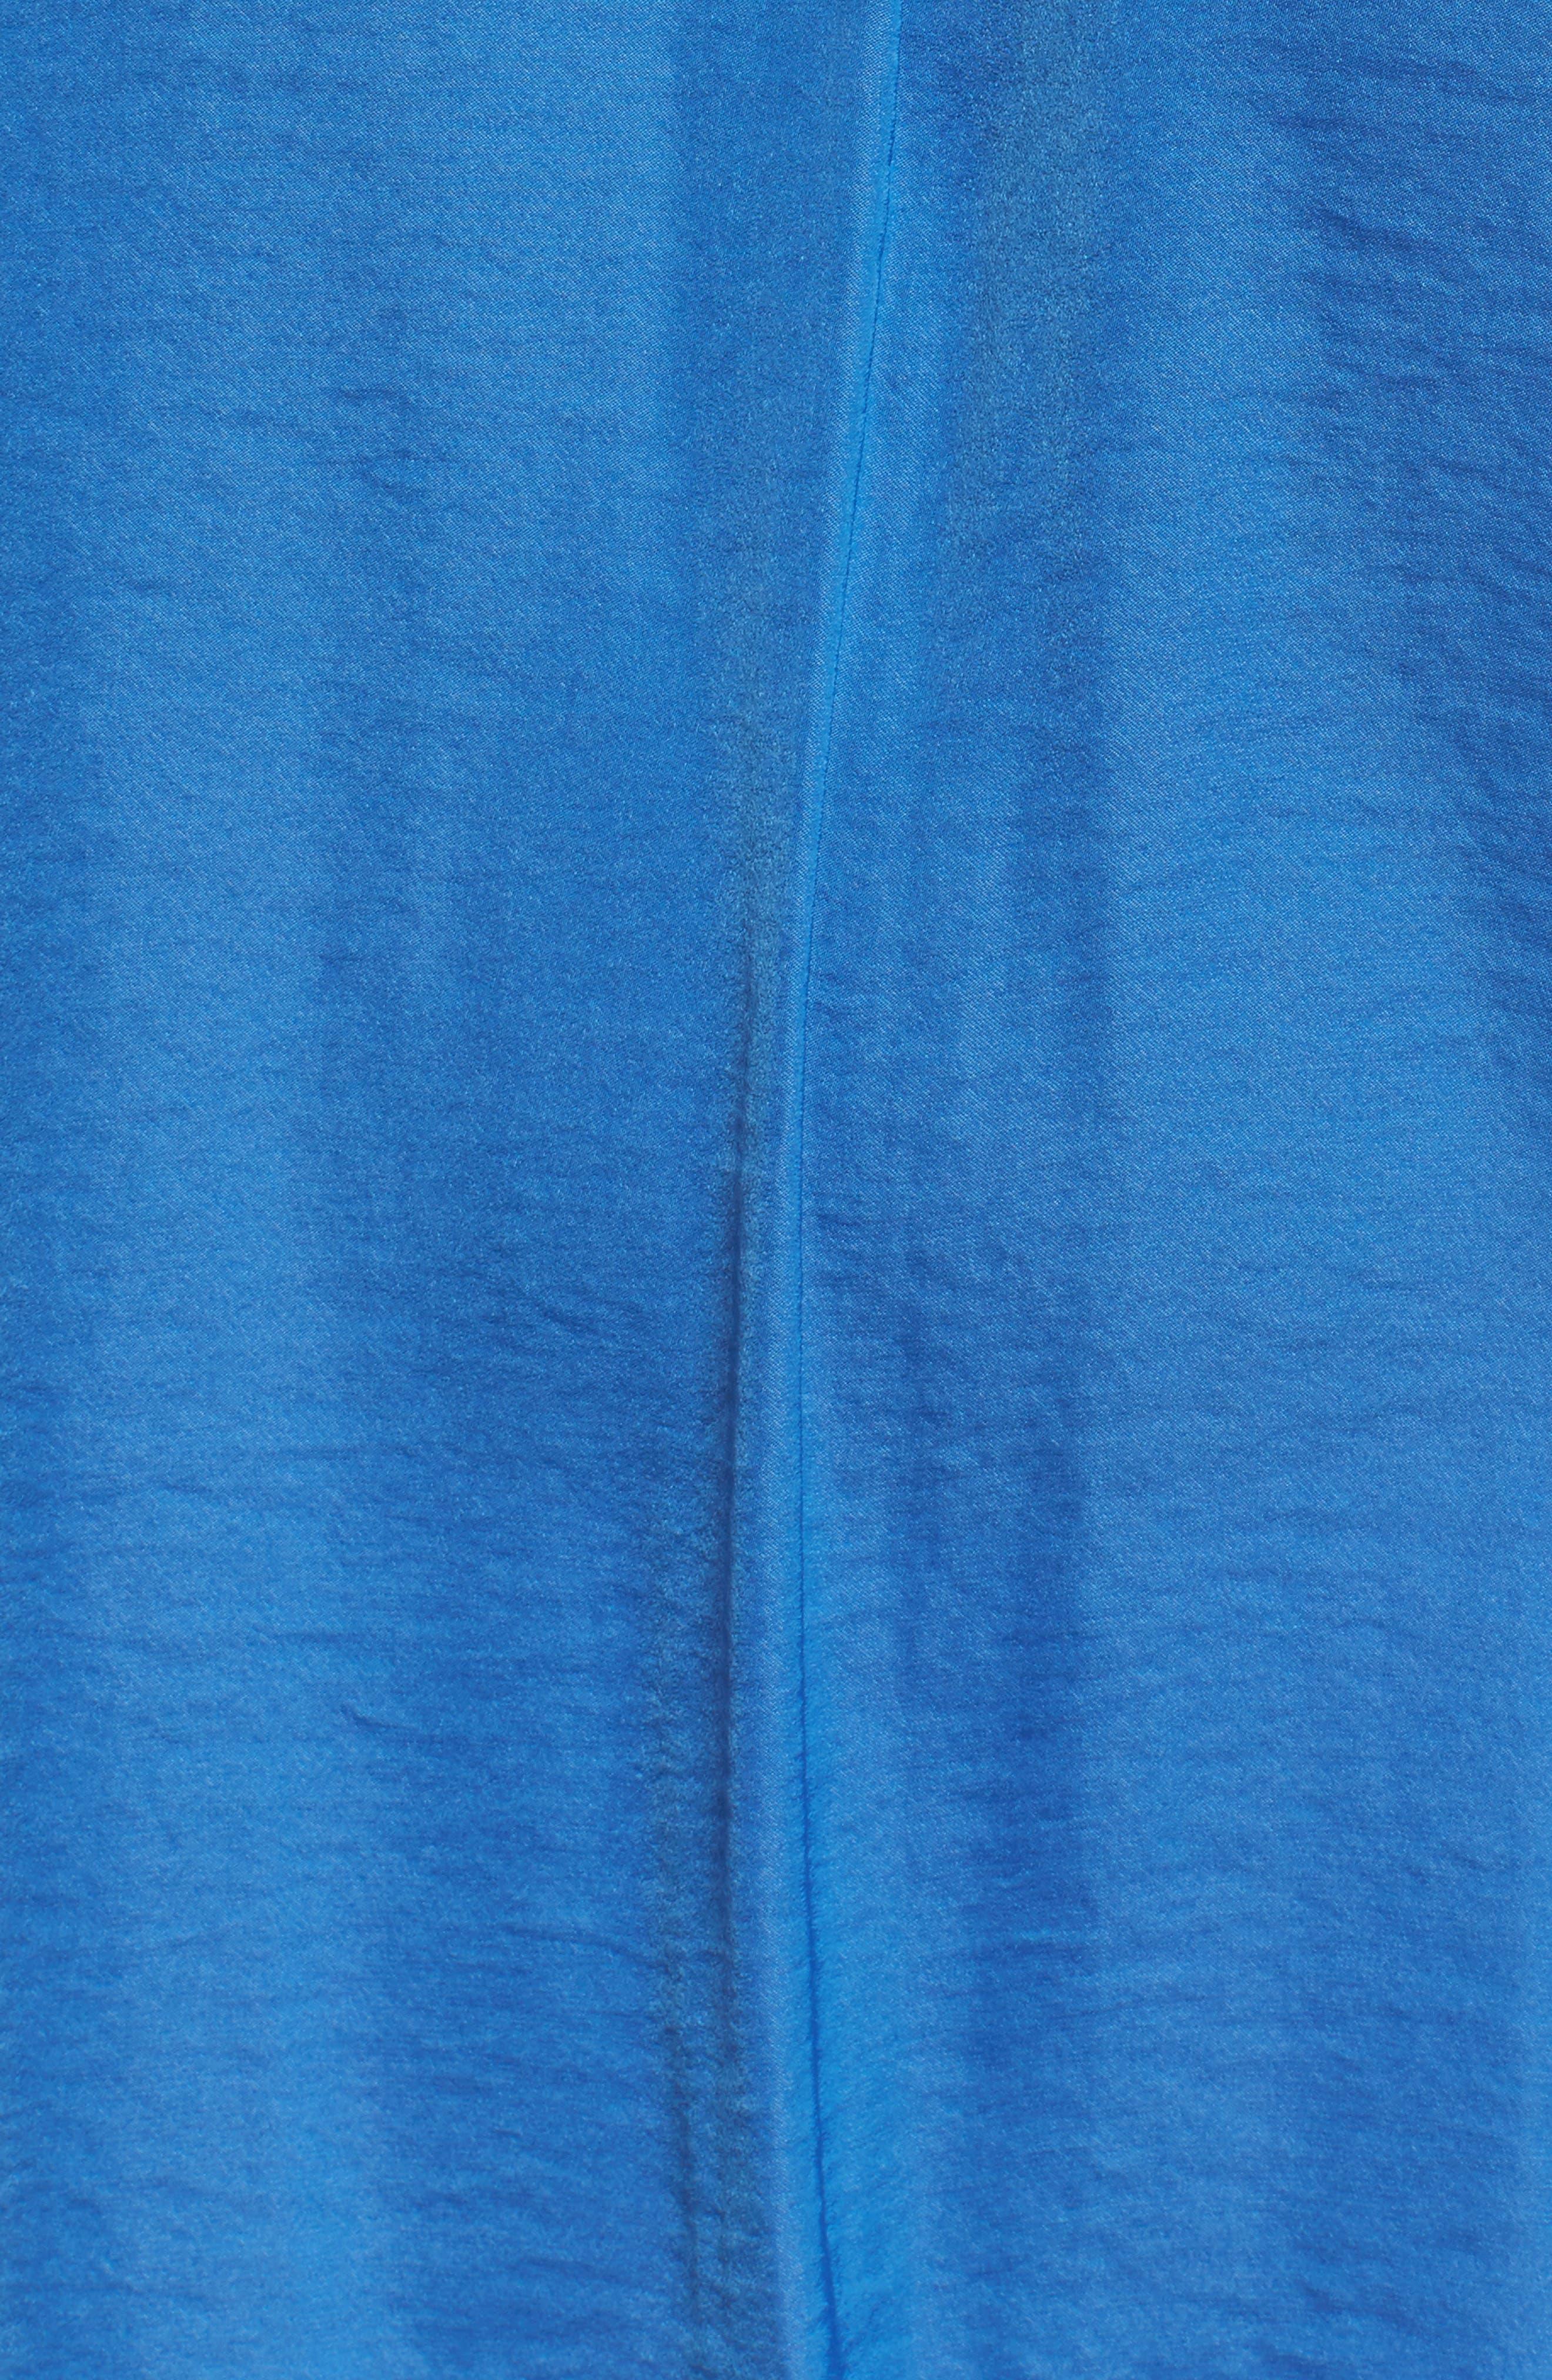 V-Neck Rumple Blouse,                             Alternate thumbnail 6, color,                             BLUE AURA